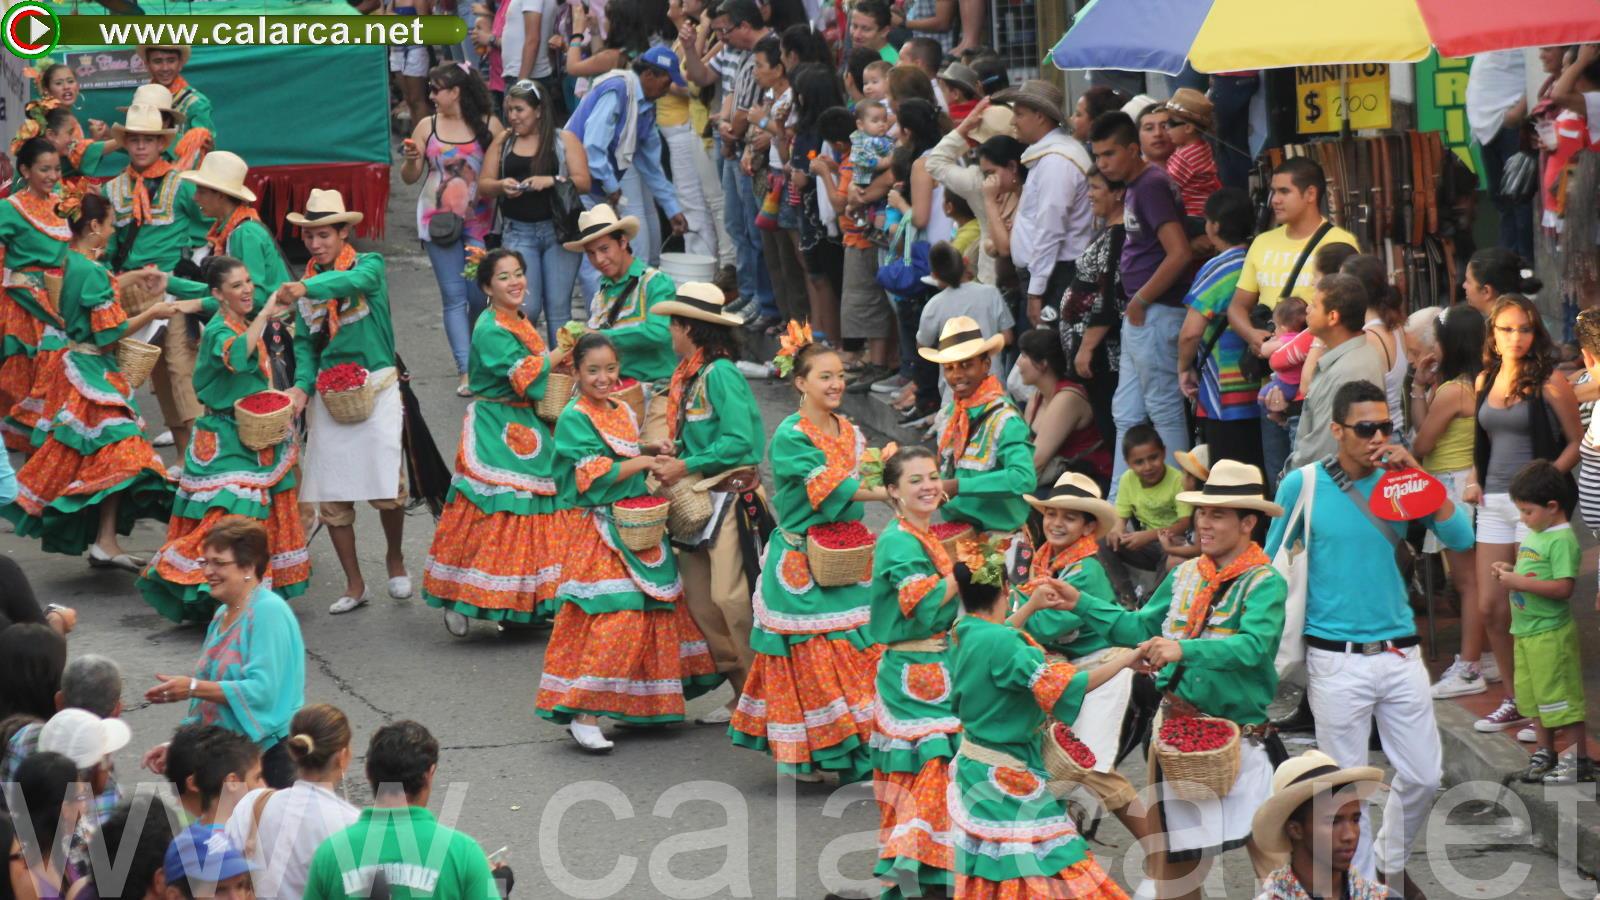 Carnaval del Paisaje Cultural Cafetero